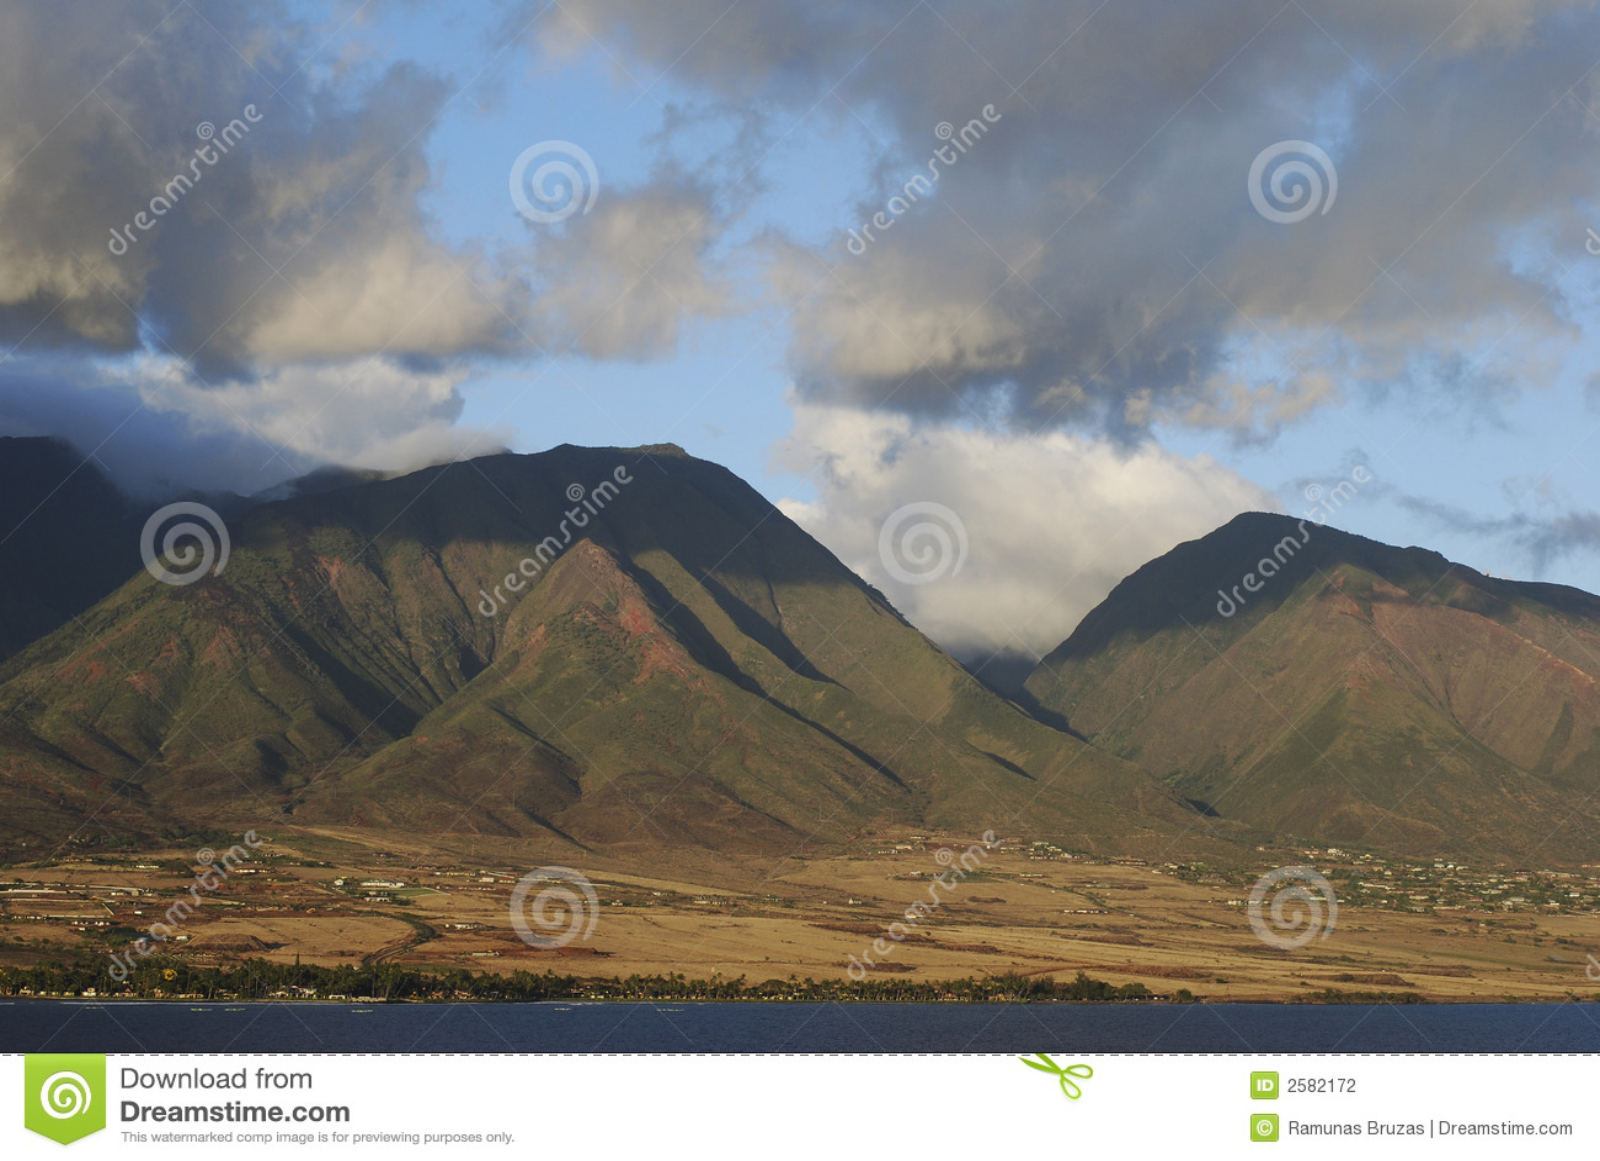 Het Eiland van Maui